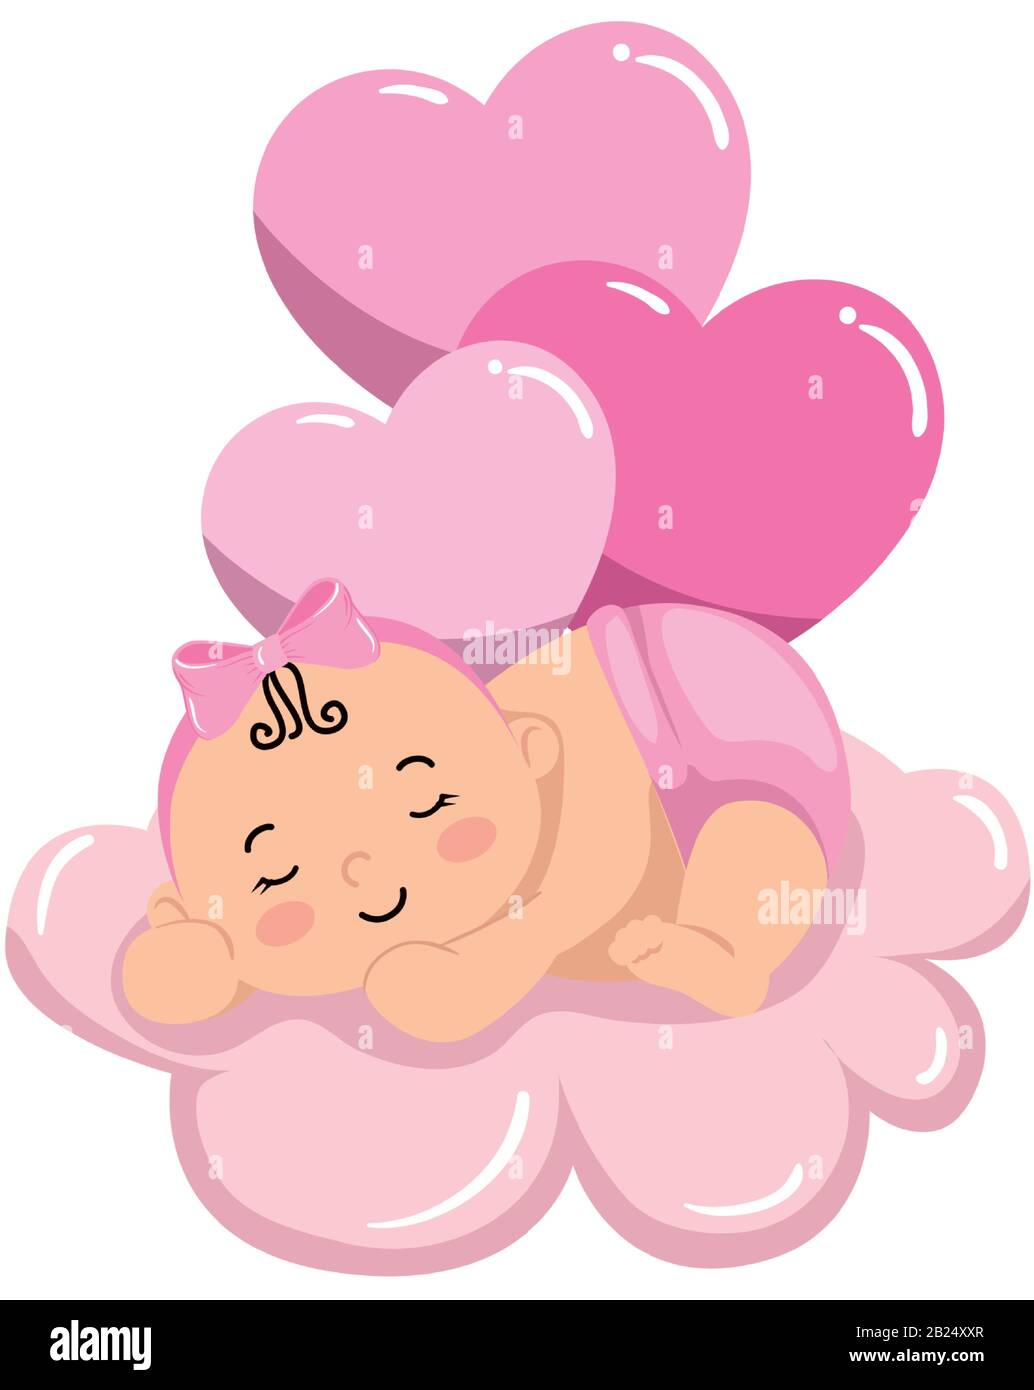 Cute Little Baby Girl Sleeping In Cloud With Balloons Helium Stock Vector Image Art Alamy